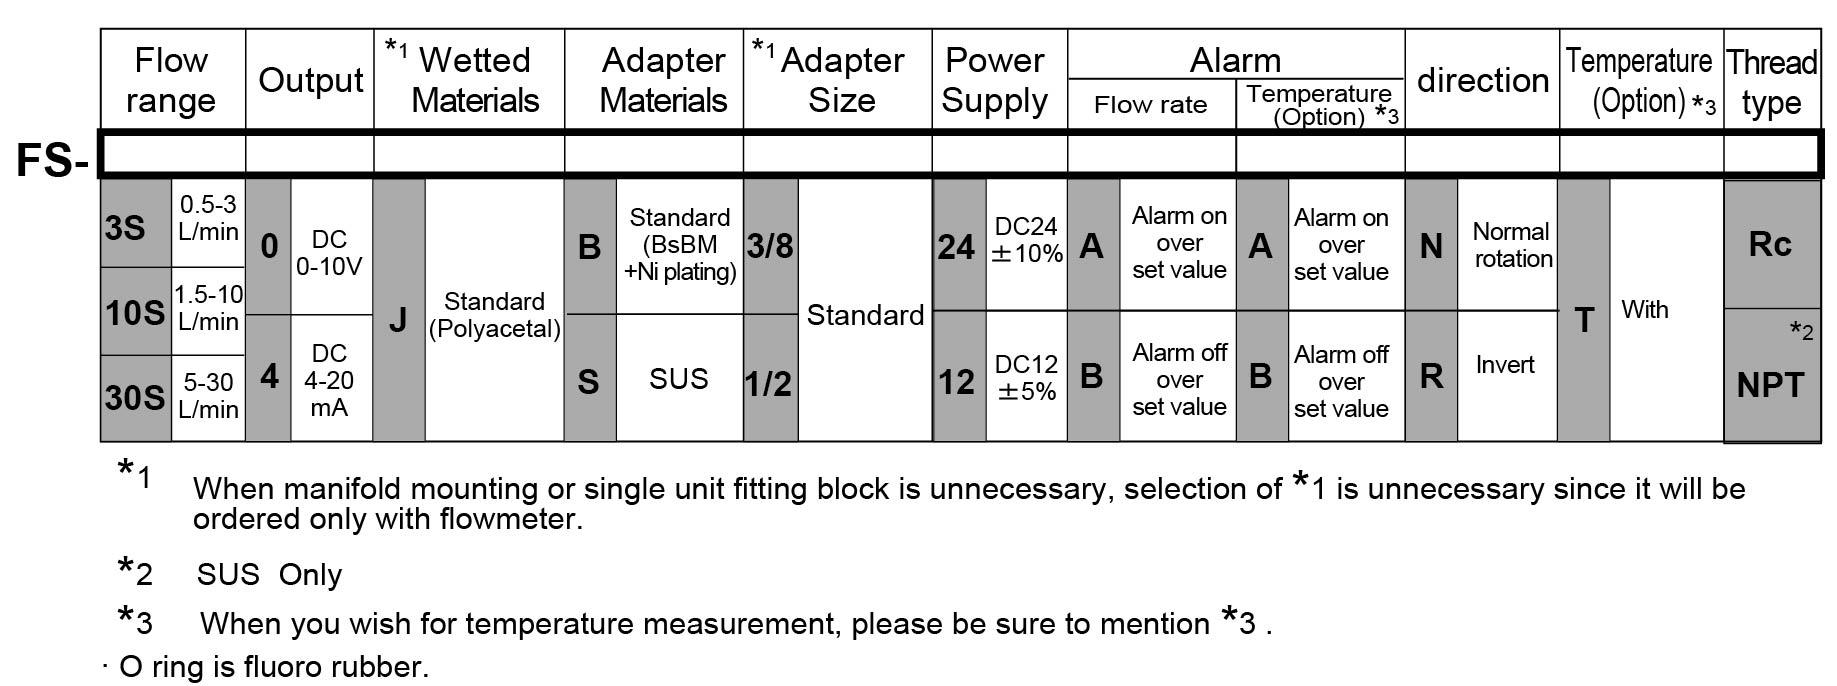 FS-C orderform